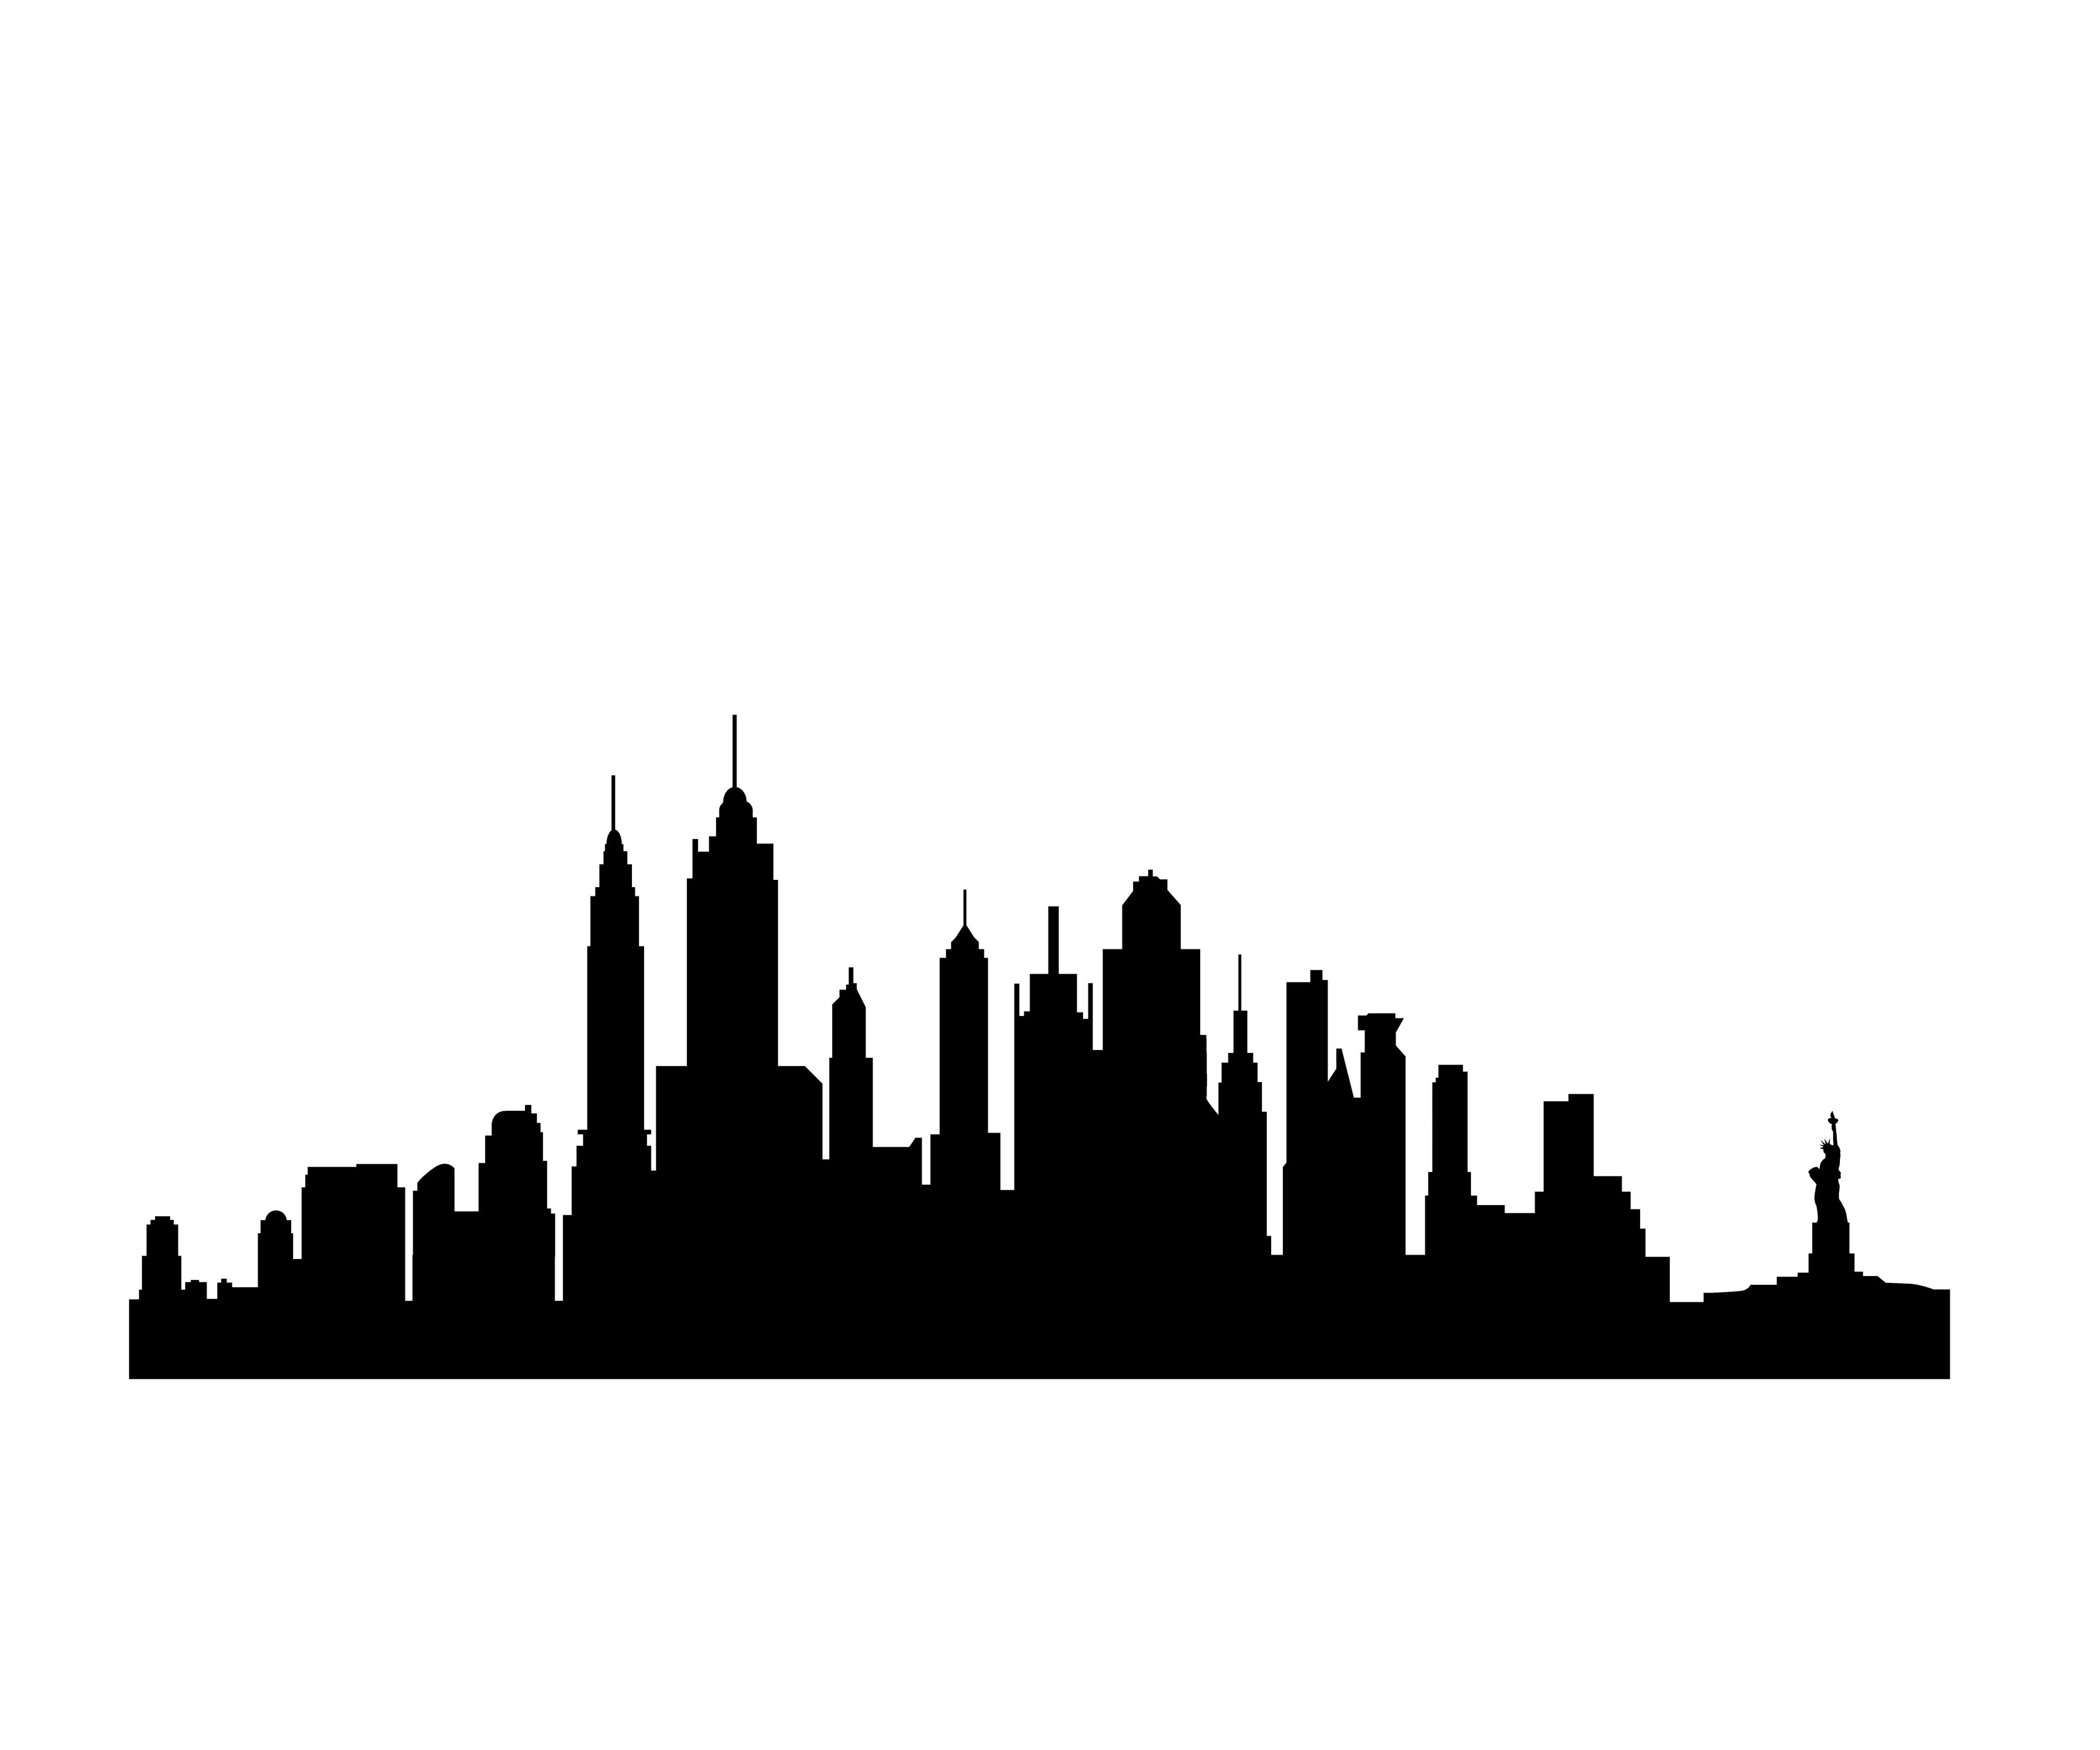 5184x4320 City Skyline Drawing Silhouette